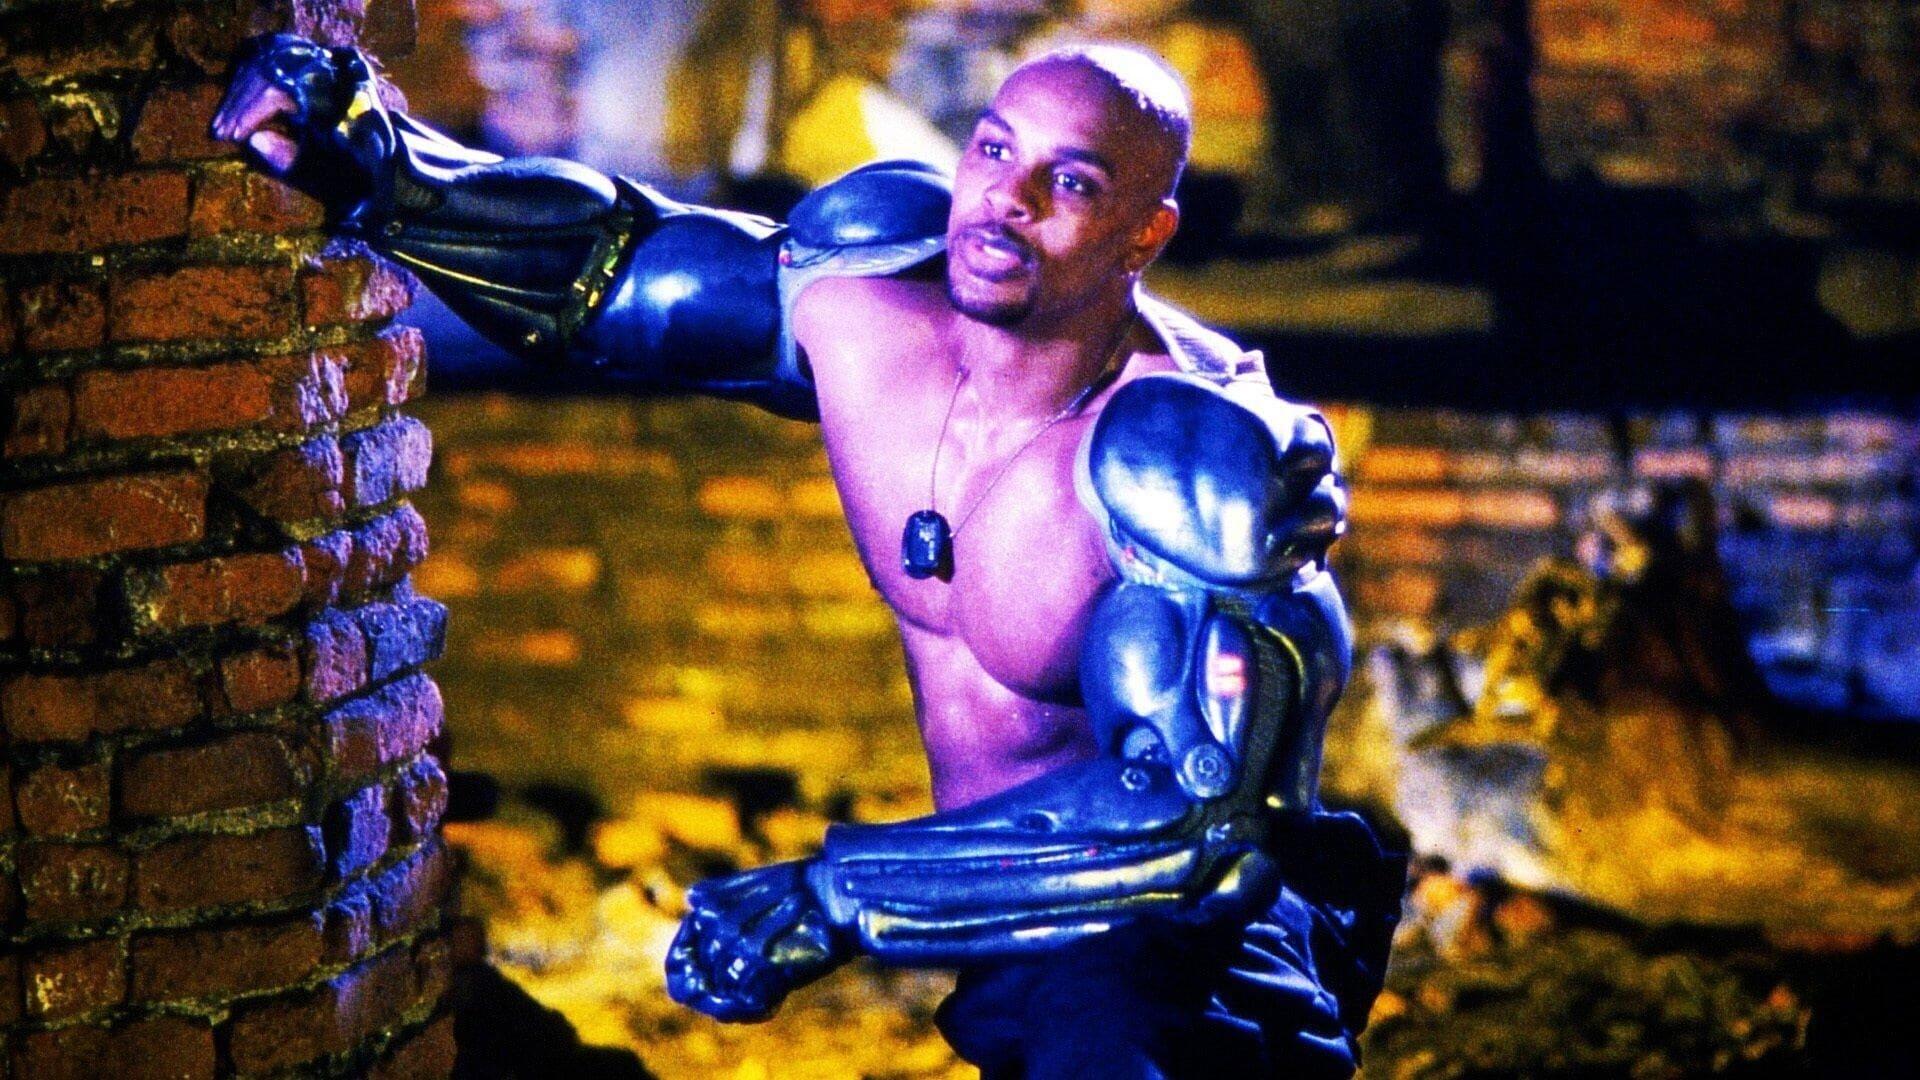 Mortal Kombat - Tilintetgjørelsen (1997)